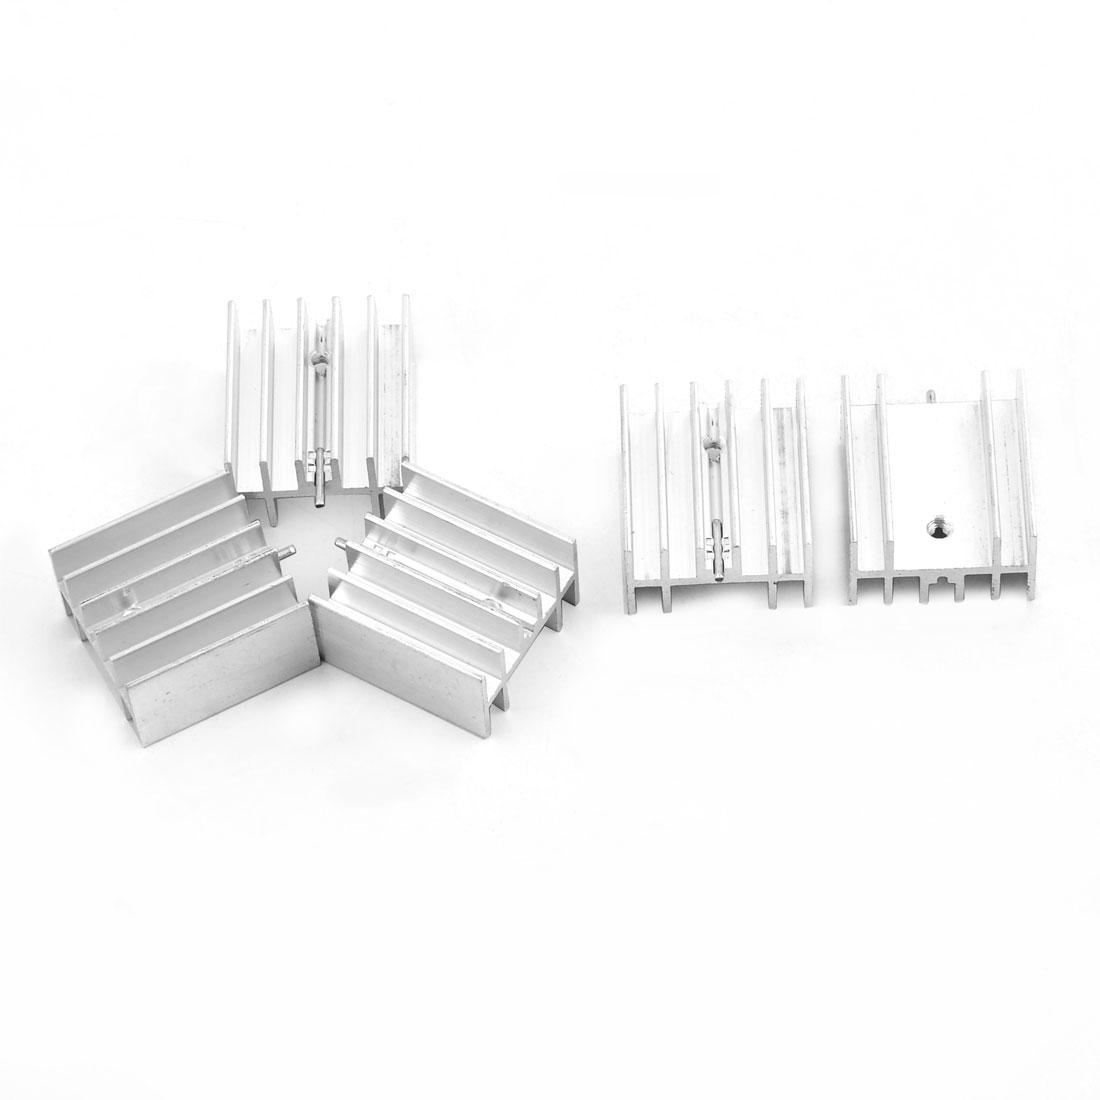 Aluminium Heatsink Cooling Fin Cooler Silver Tone 23.5mm x 25mm x 15mm 5 Pcs